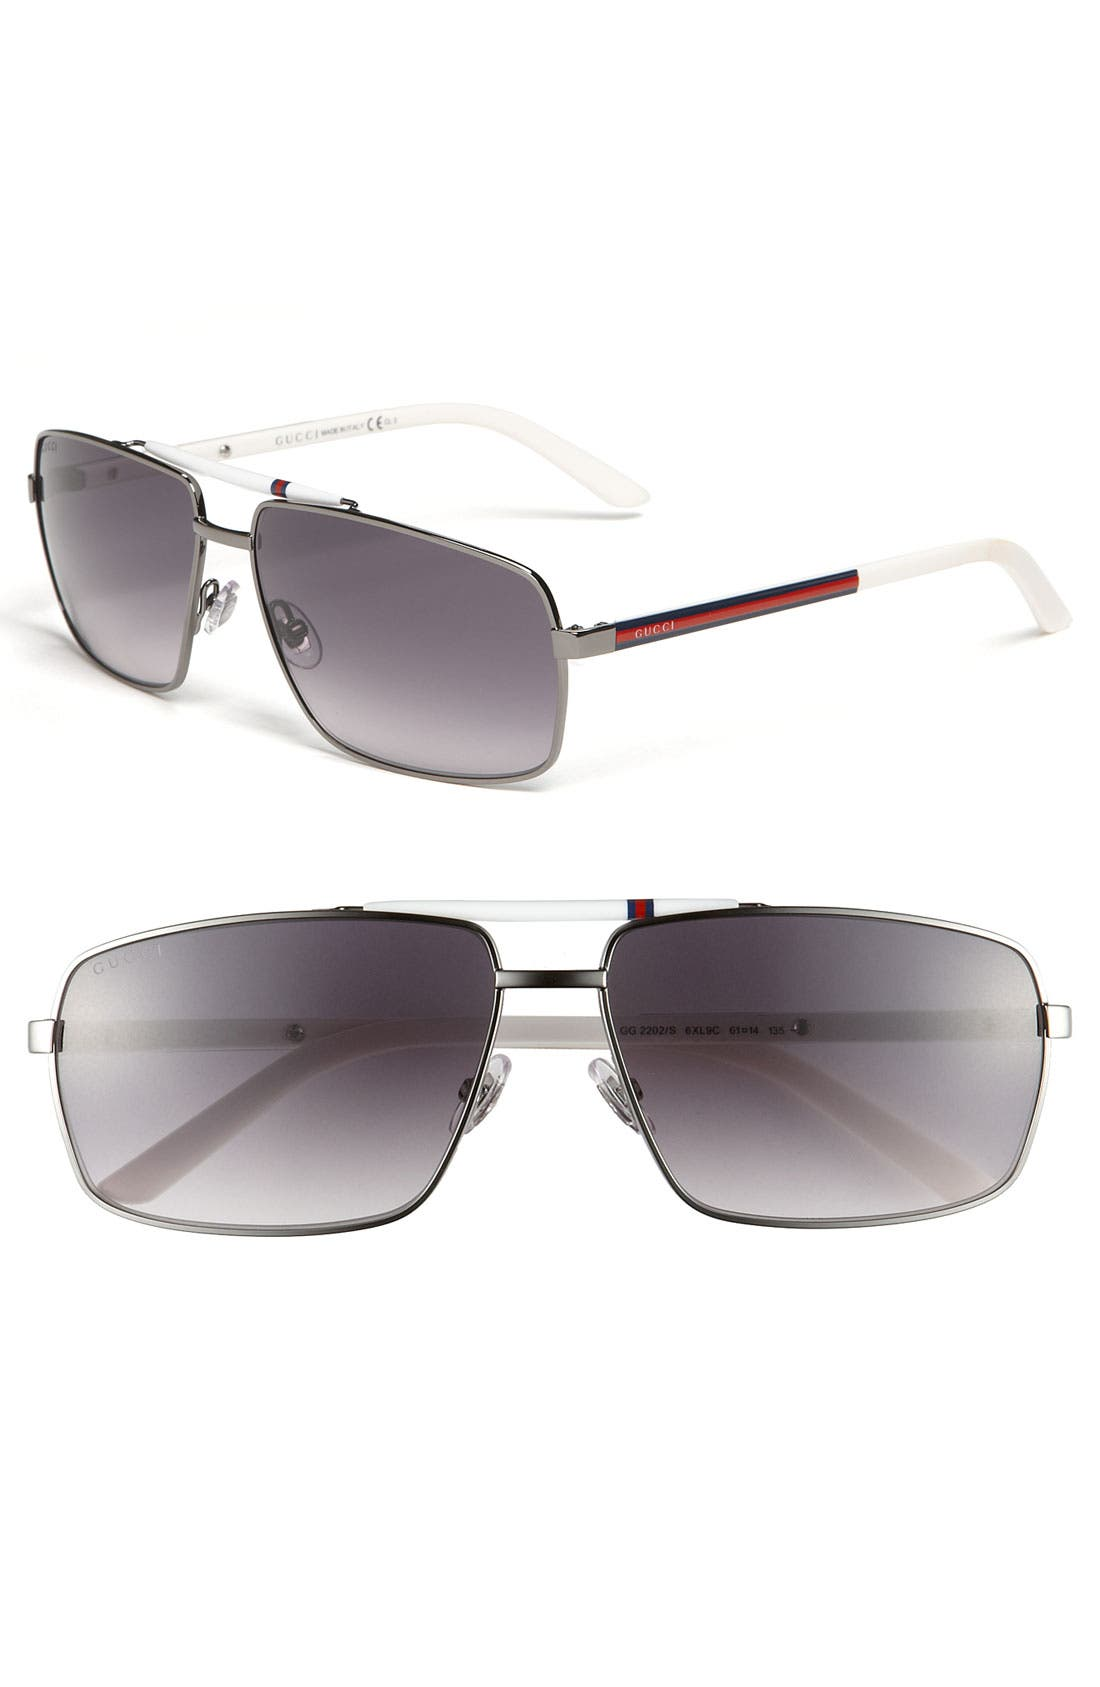 Main Image - Gucci 61mm Metal Sunglasses